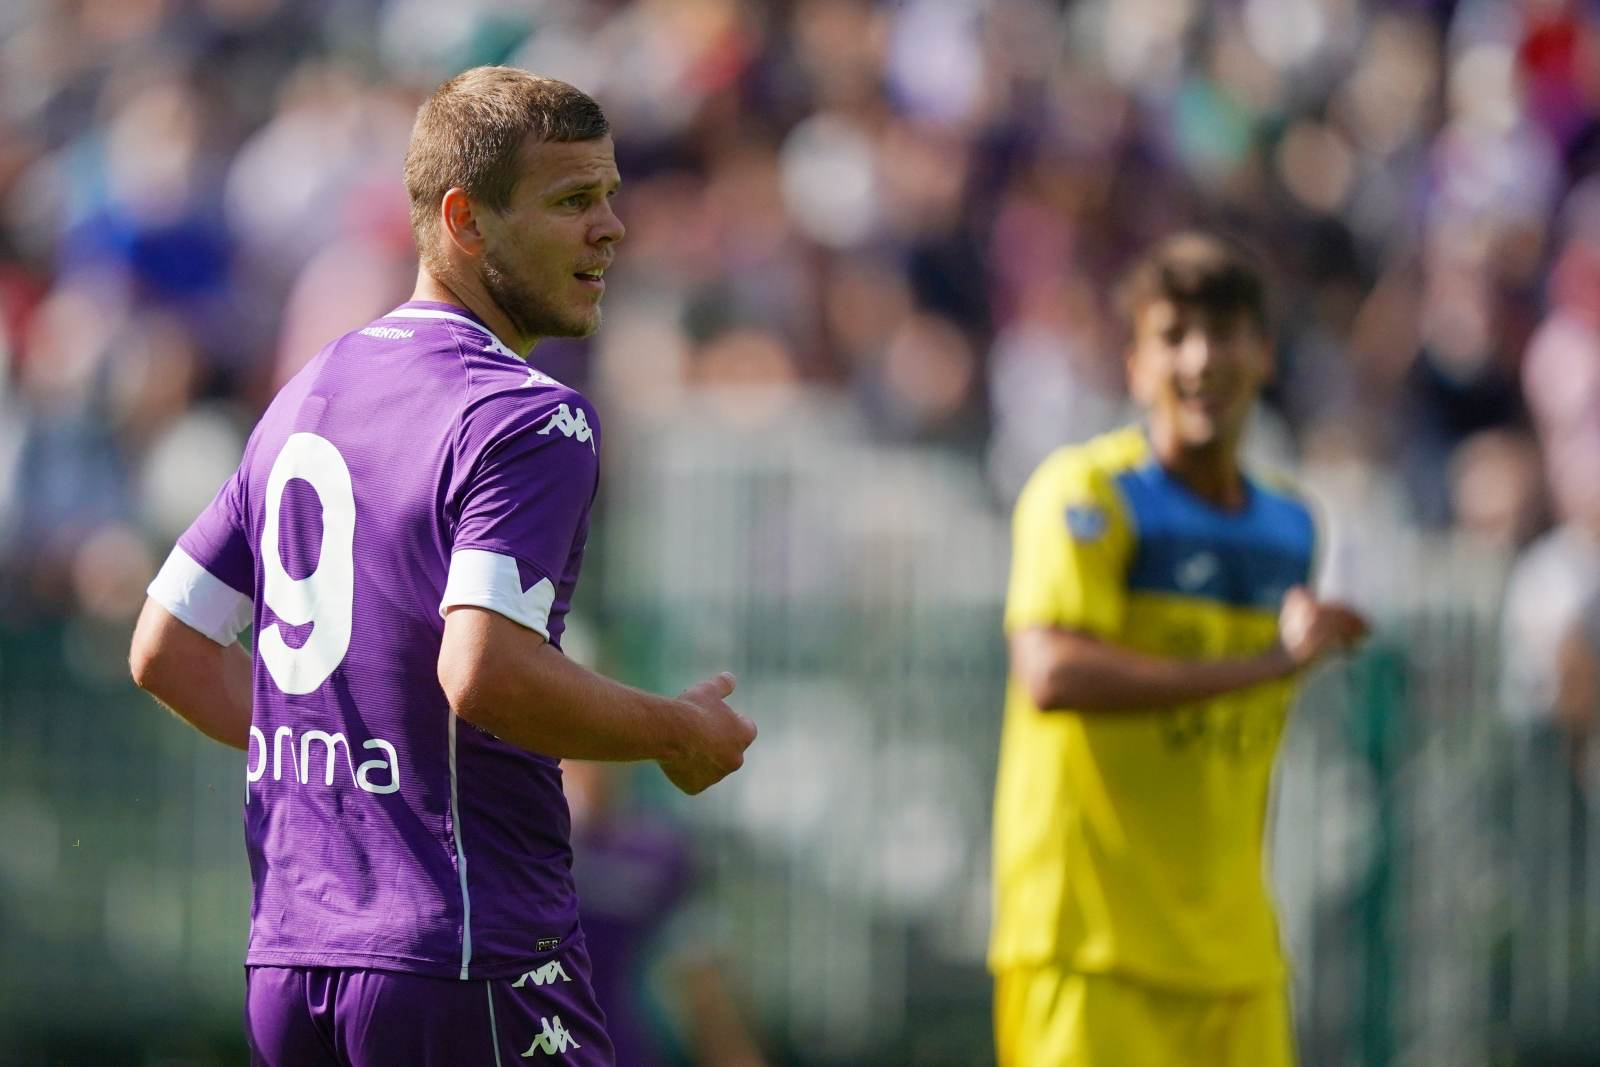 Кокорина признали одним из двух худших трансферов Серии А